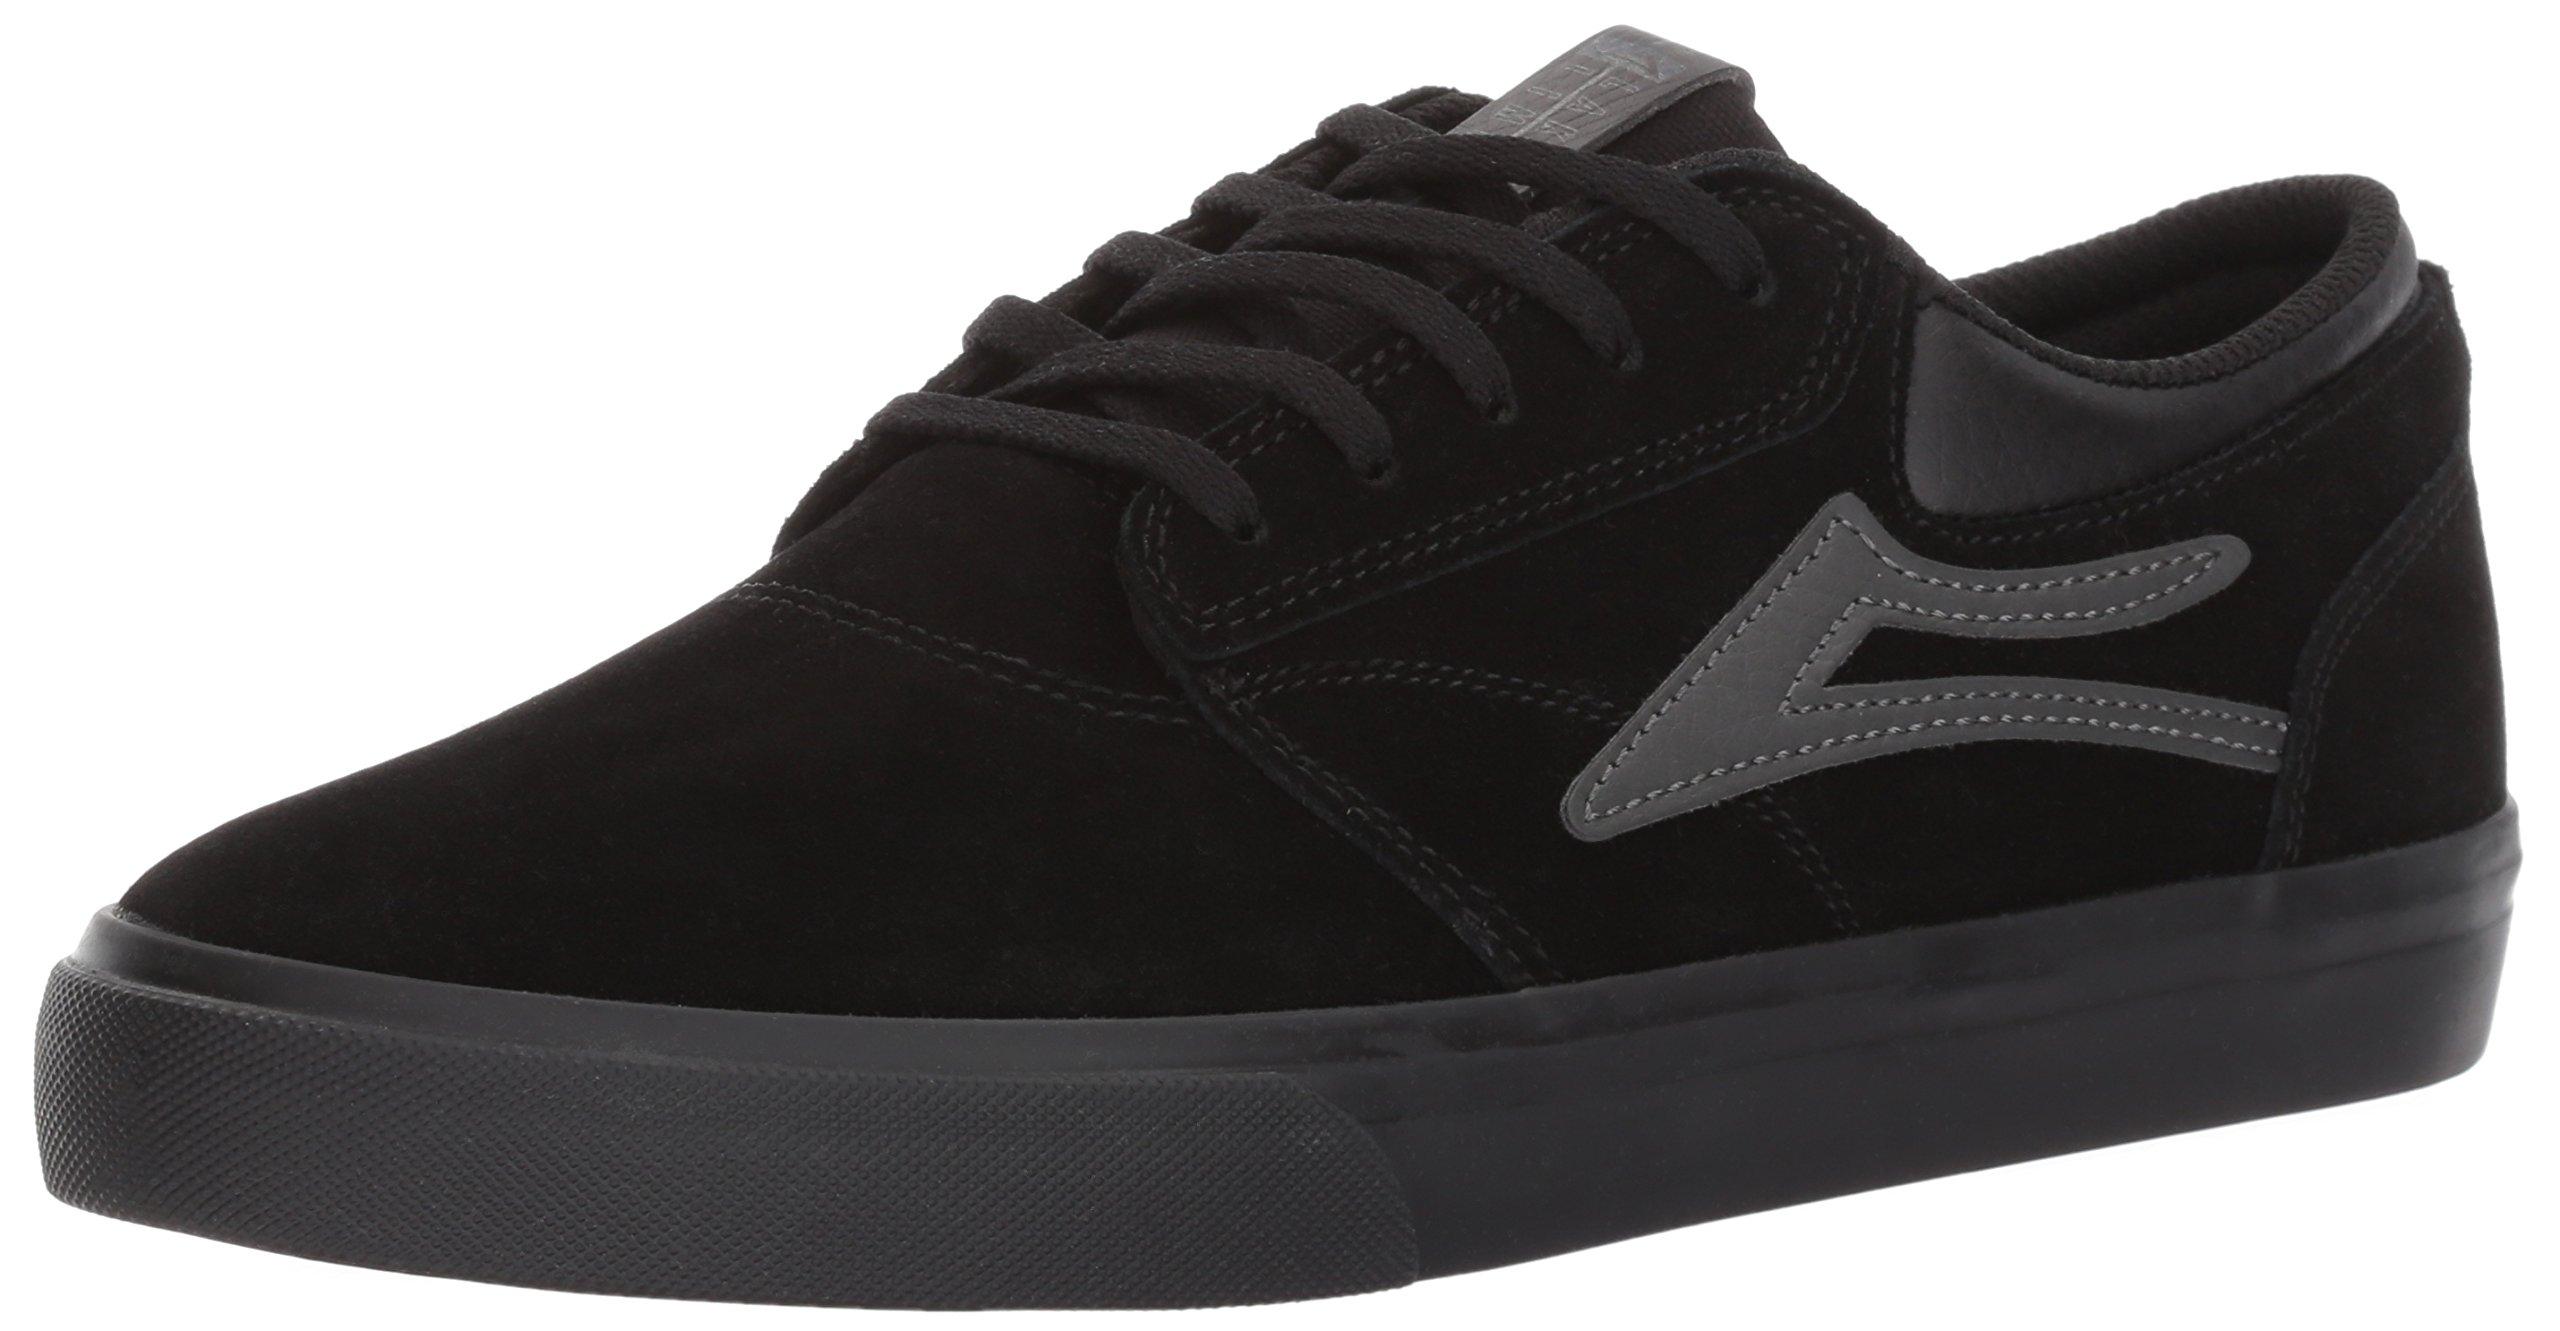 Lakai Griffin Skate Shoe, Black Suede, 5.5 M US by Lakai